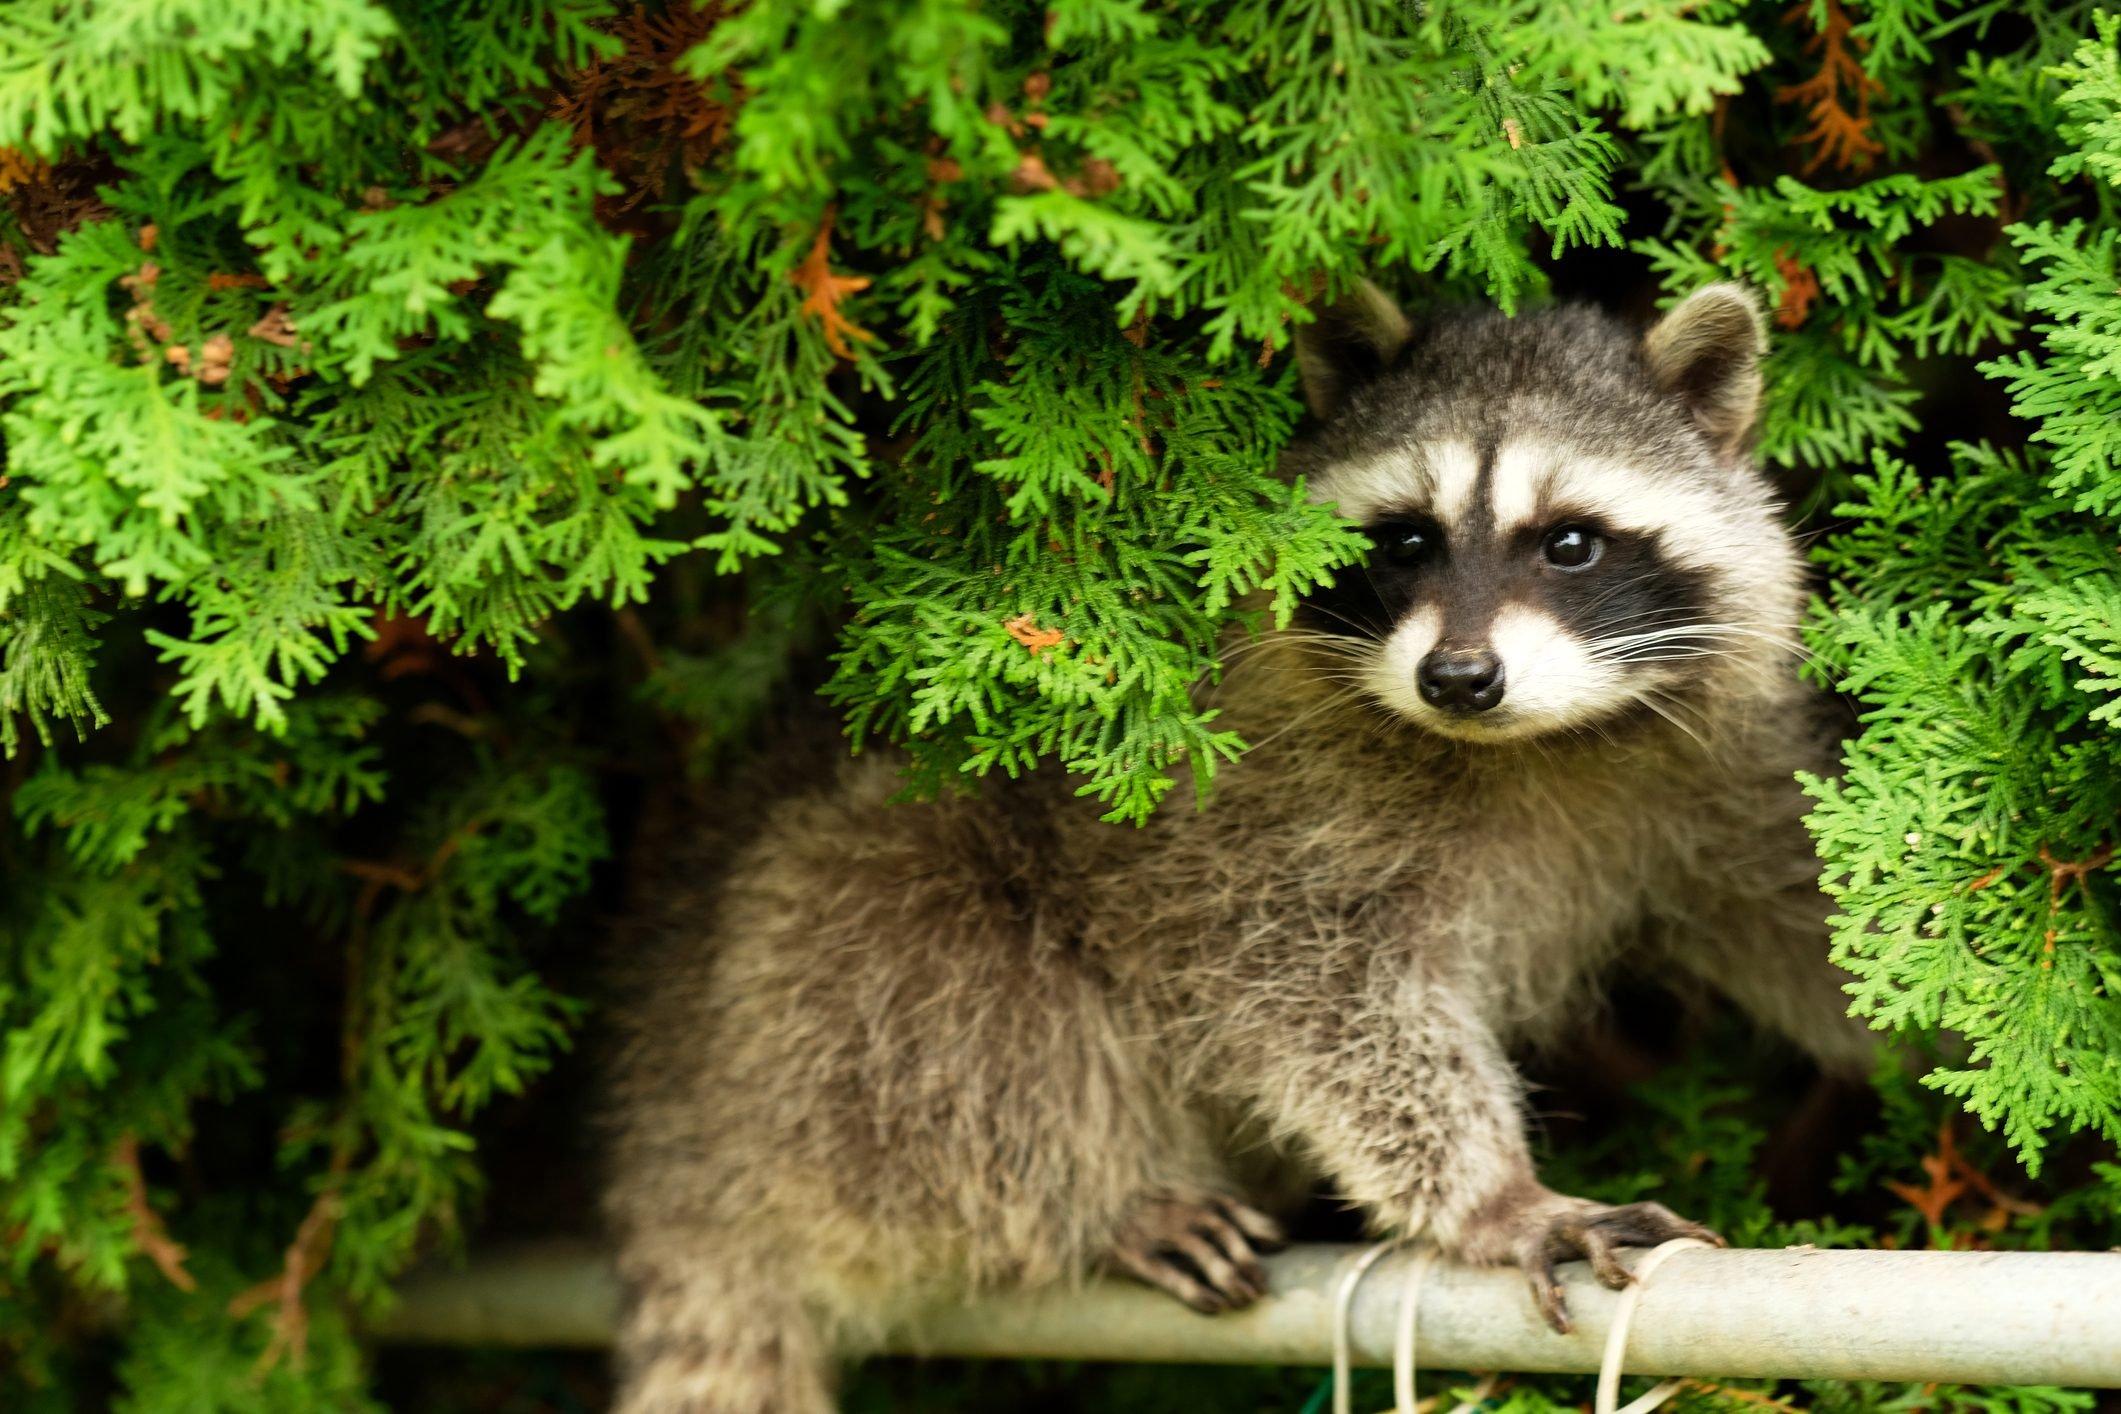 Cute burglar (young raccoon)